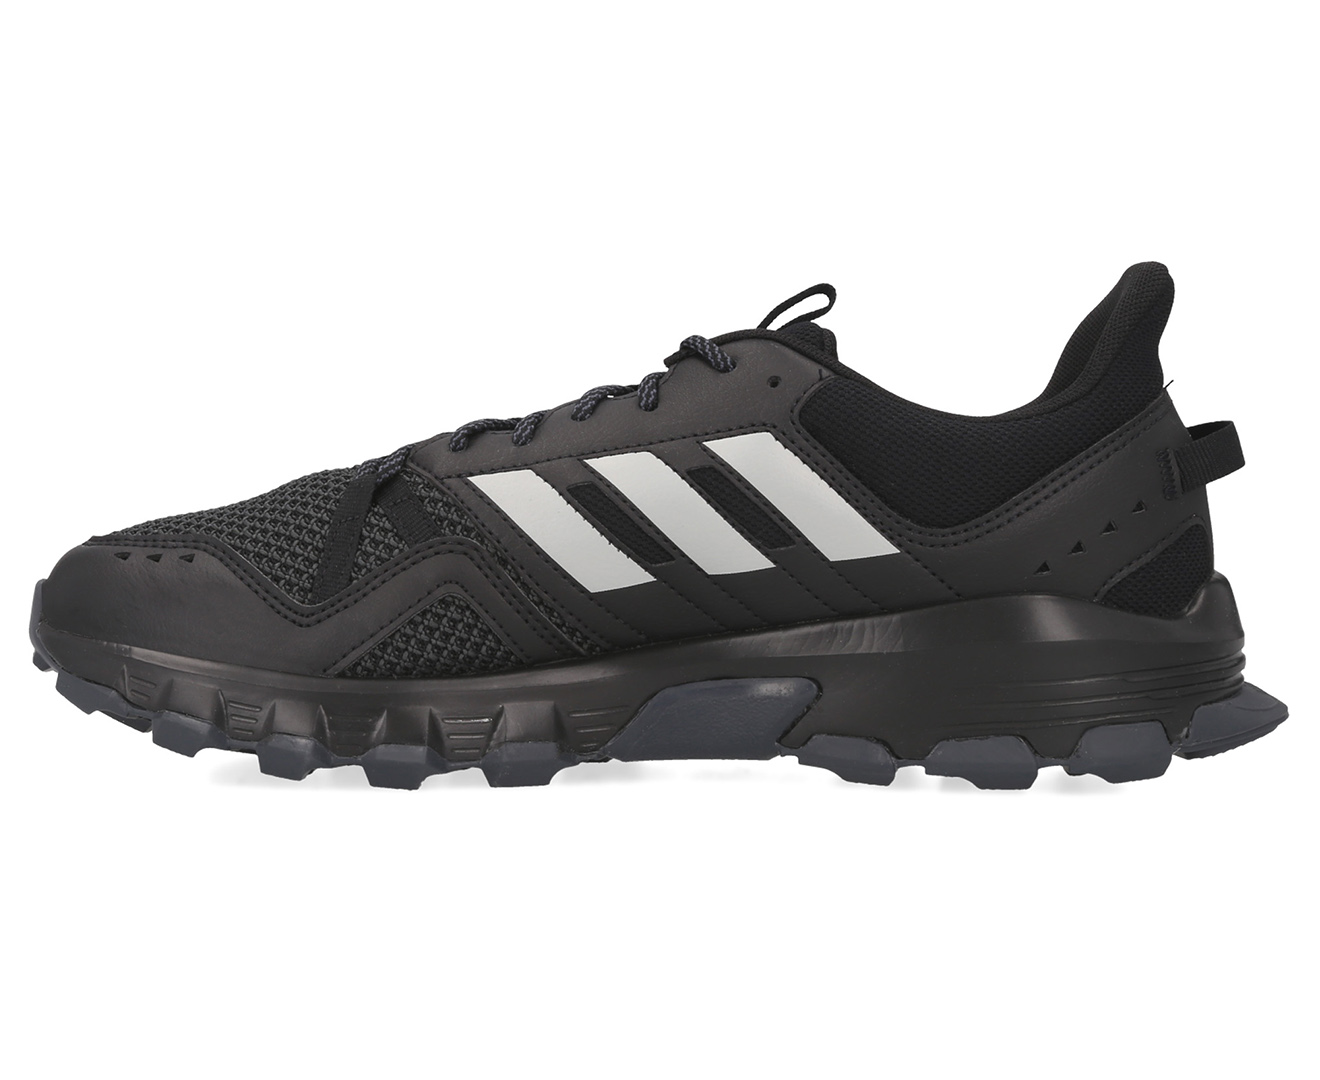 Details about Adidas Men's Rockadia Trail Running Shoes Core BlackGrey TwoGrey Six